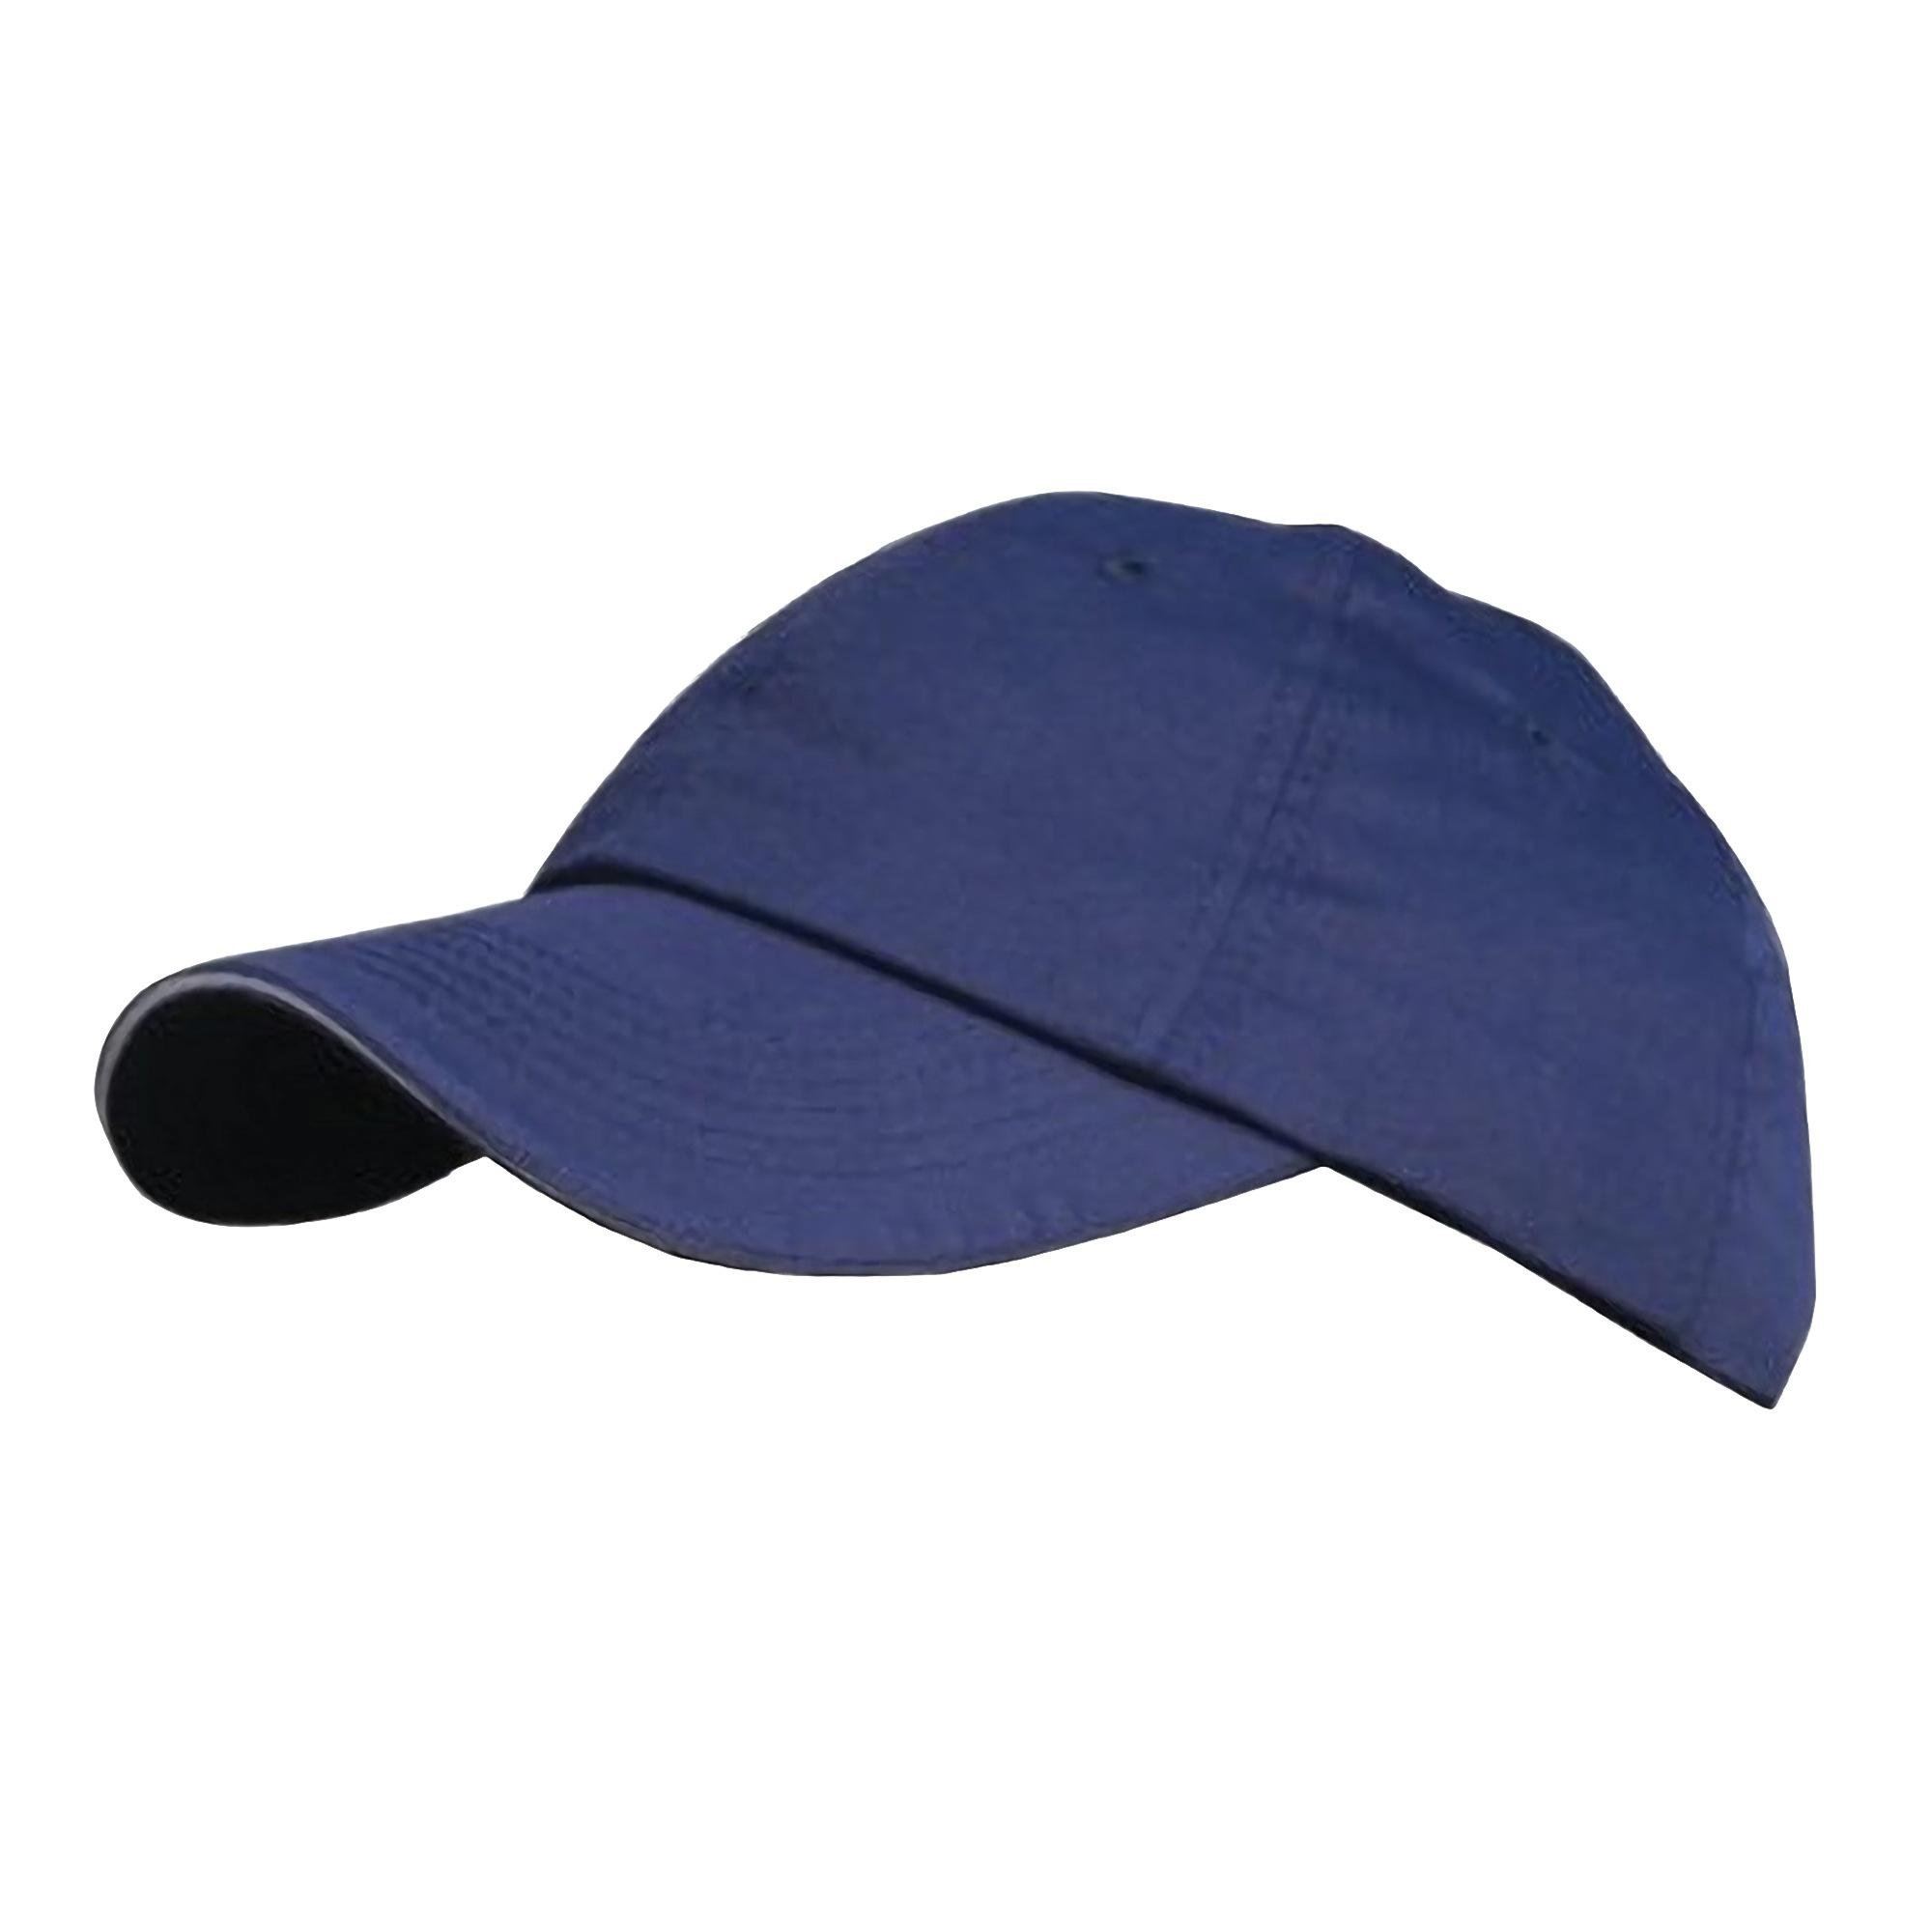 Result Baseball Cap Premium Baseball Kappe, einfarbig (2 Stück/Packung) | Accessoires > Caps > Baseball Caps | Result